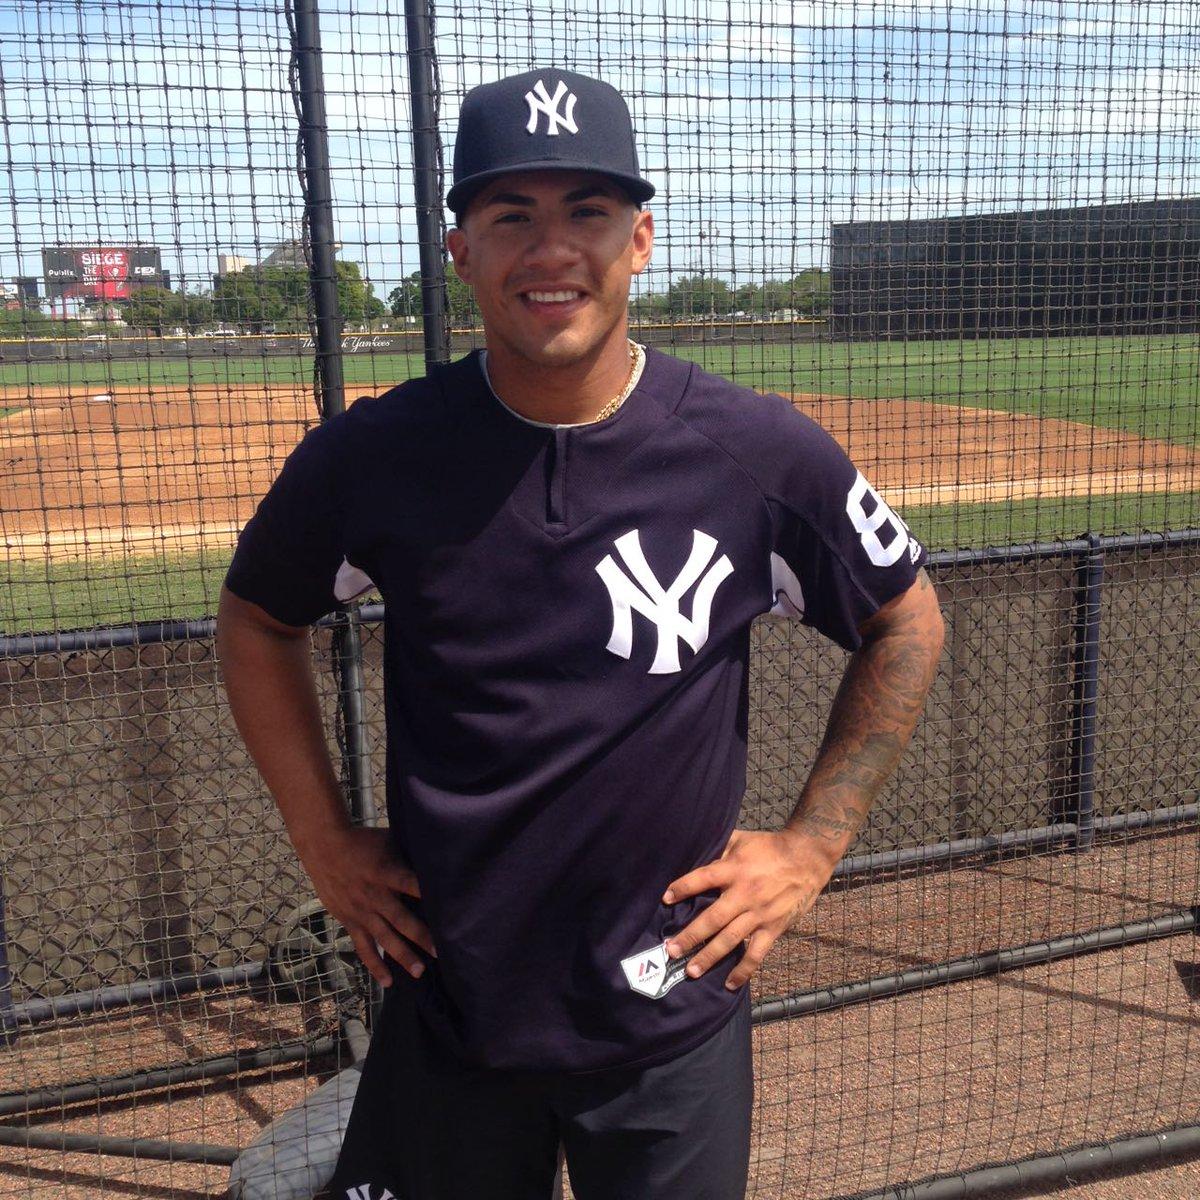 Gleyber Torres es la gema de los Yanquis (@Yankees_Beisbol) #MLB #Yankees  https:// goo.gl/XISWD0  &nbsp;  <br>http://pic.twitter.com/vqiF8y6tQz